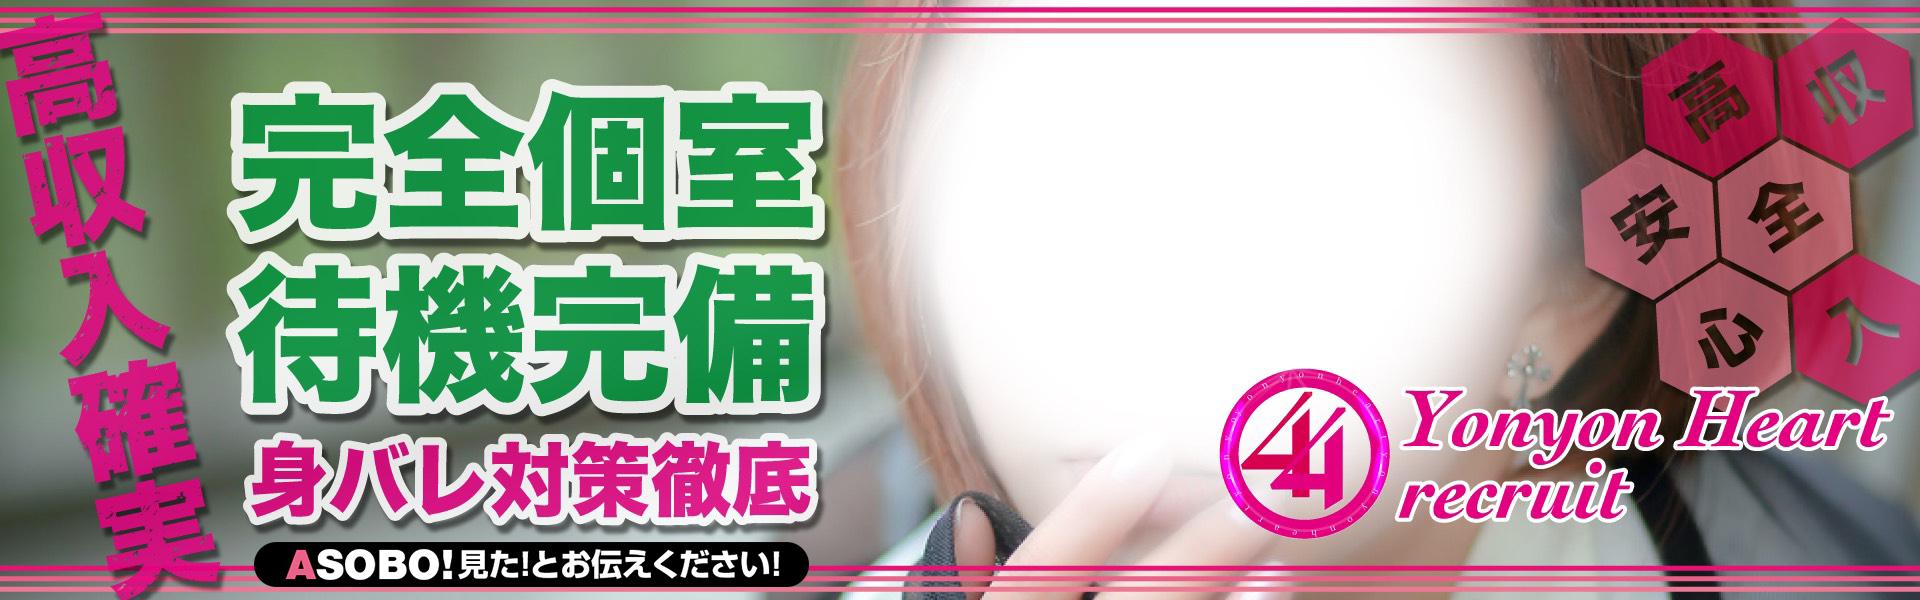 44 heart 〜ヨンヨンハート〜庄内店